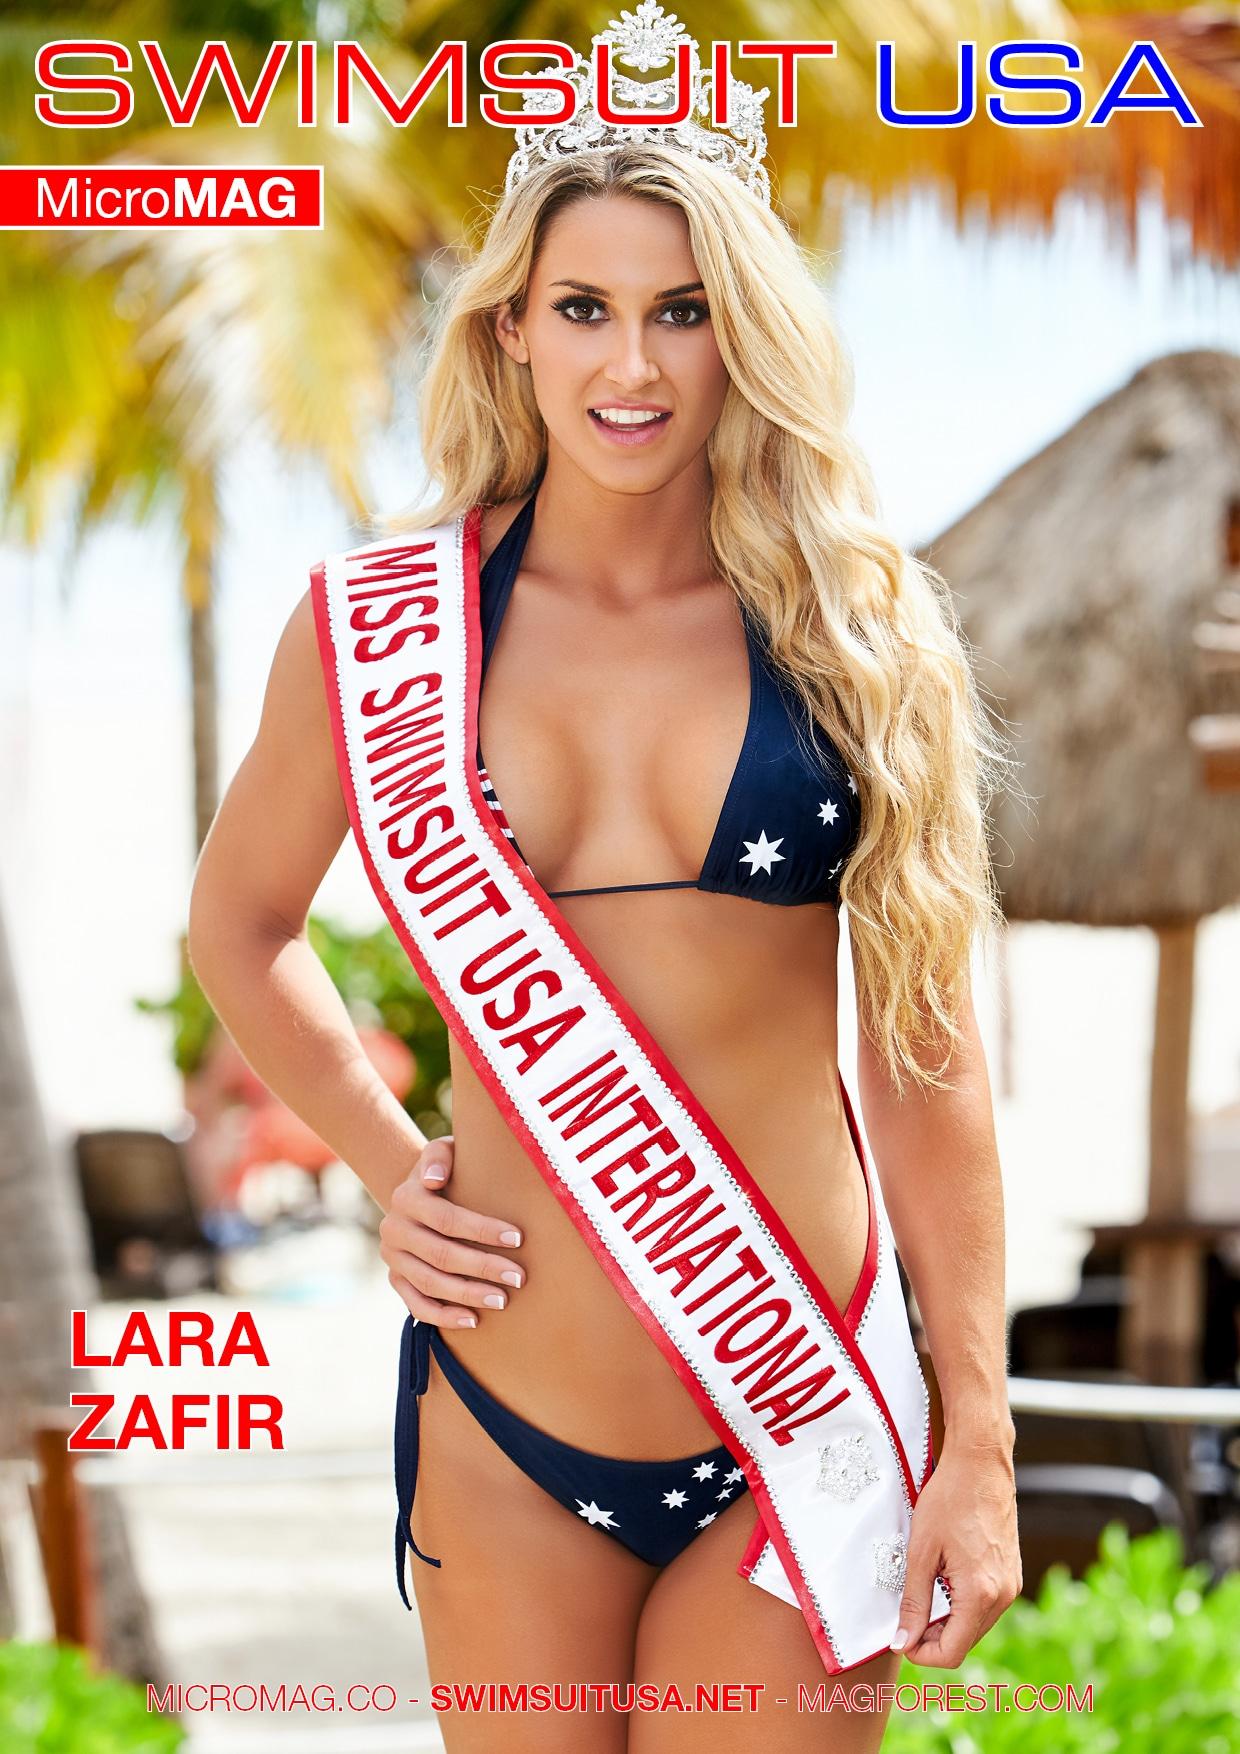 Swimsuit USA MicroMAG - Lara Zafir - Issue 3